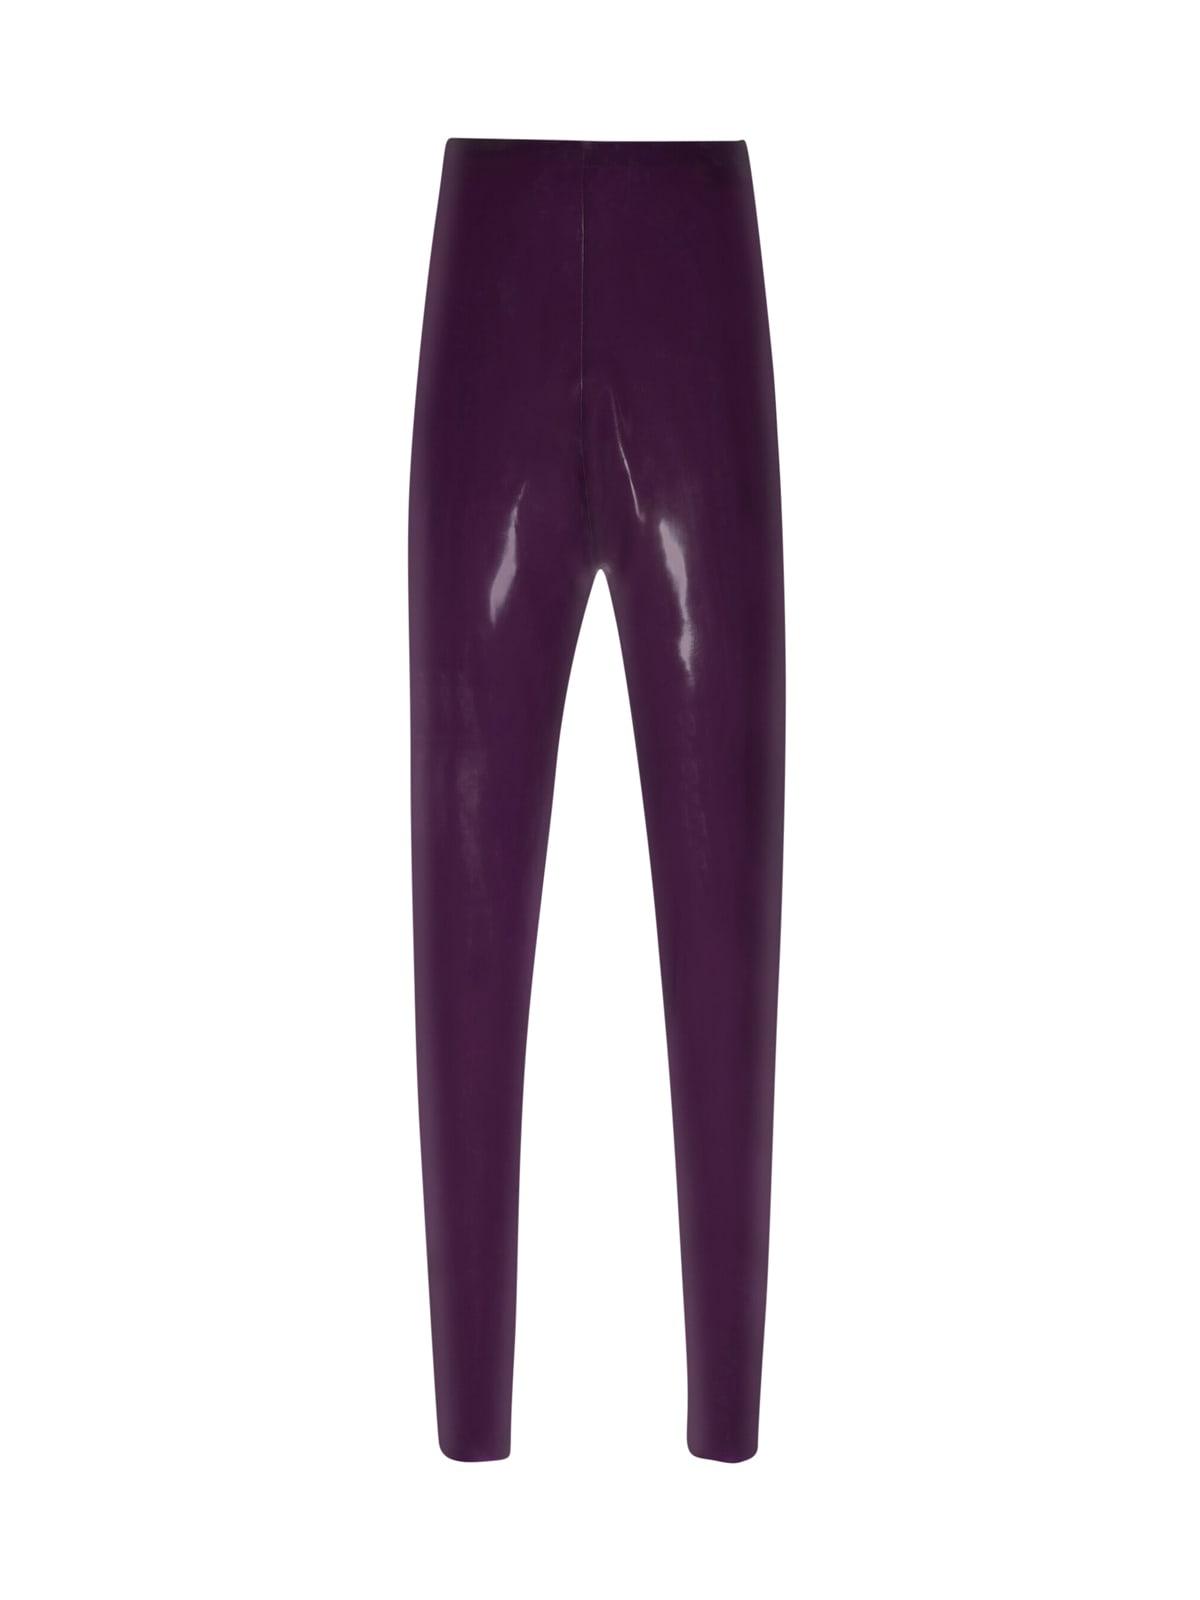 Saint Laurent Lipstic Rubber In Purple